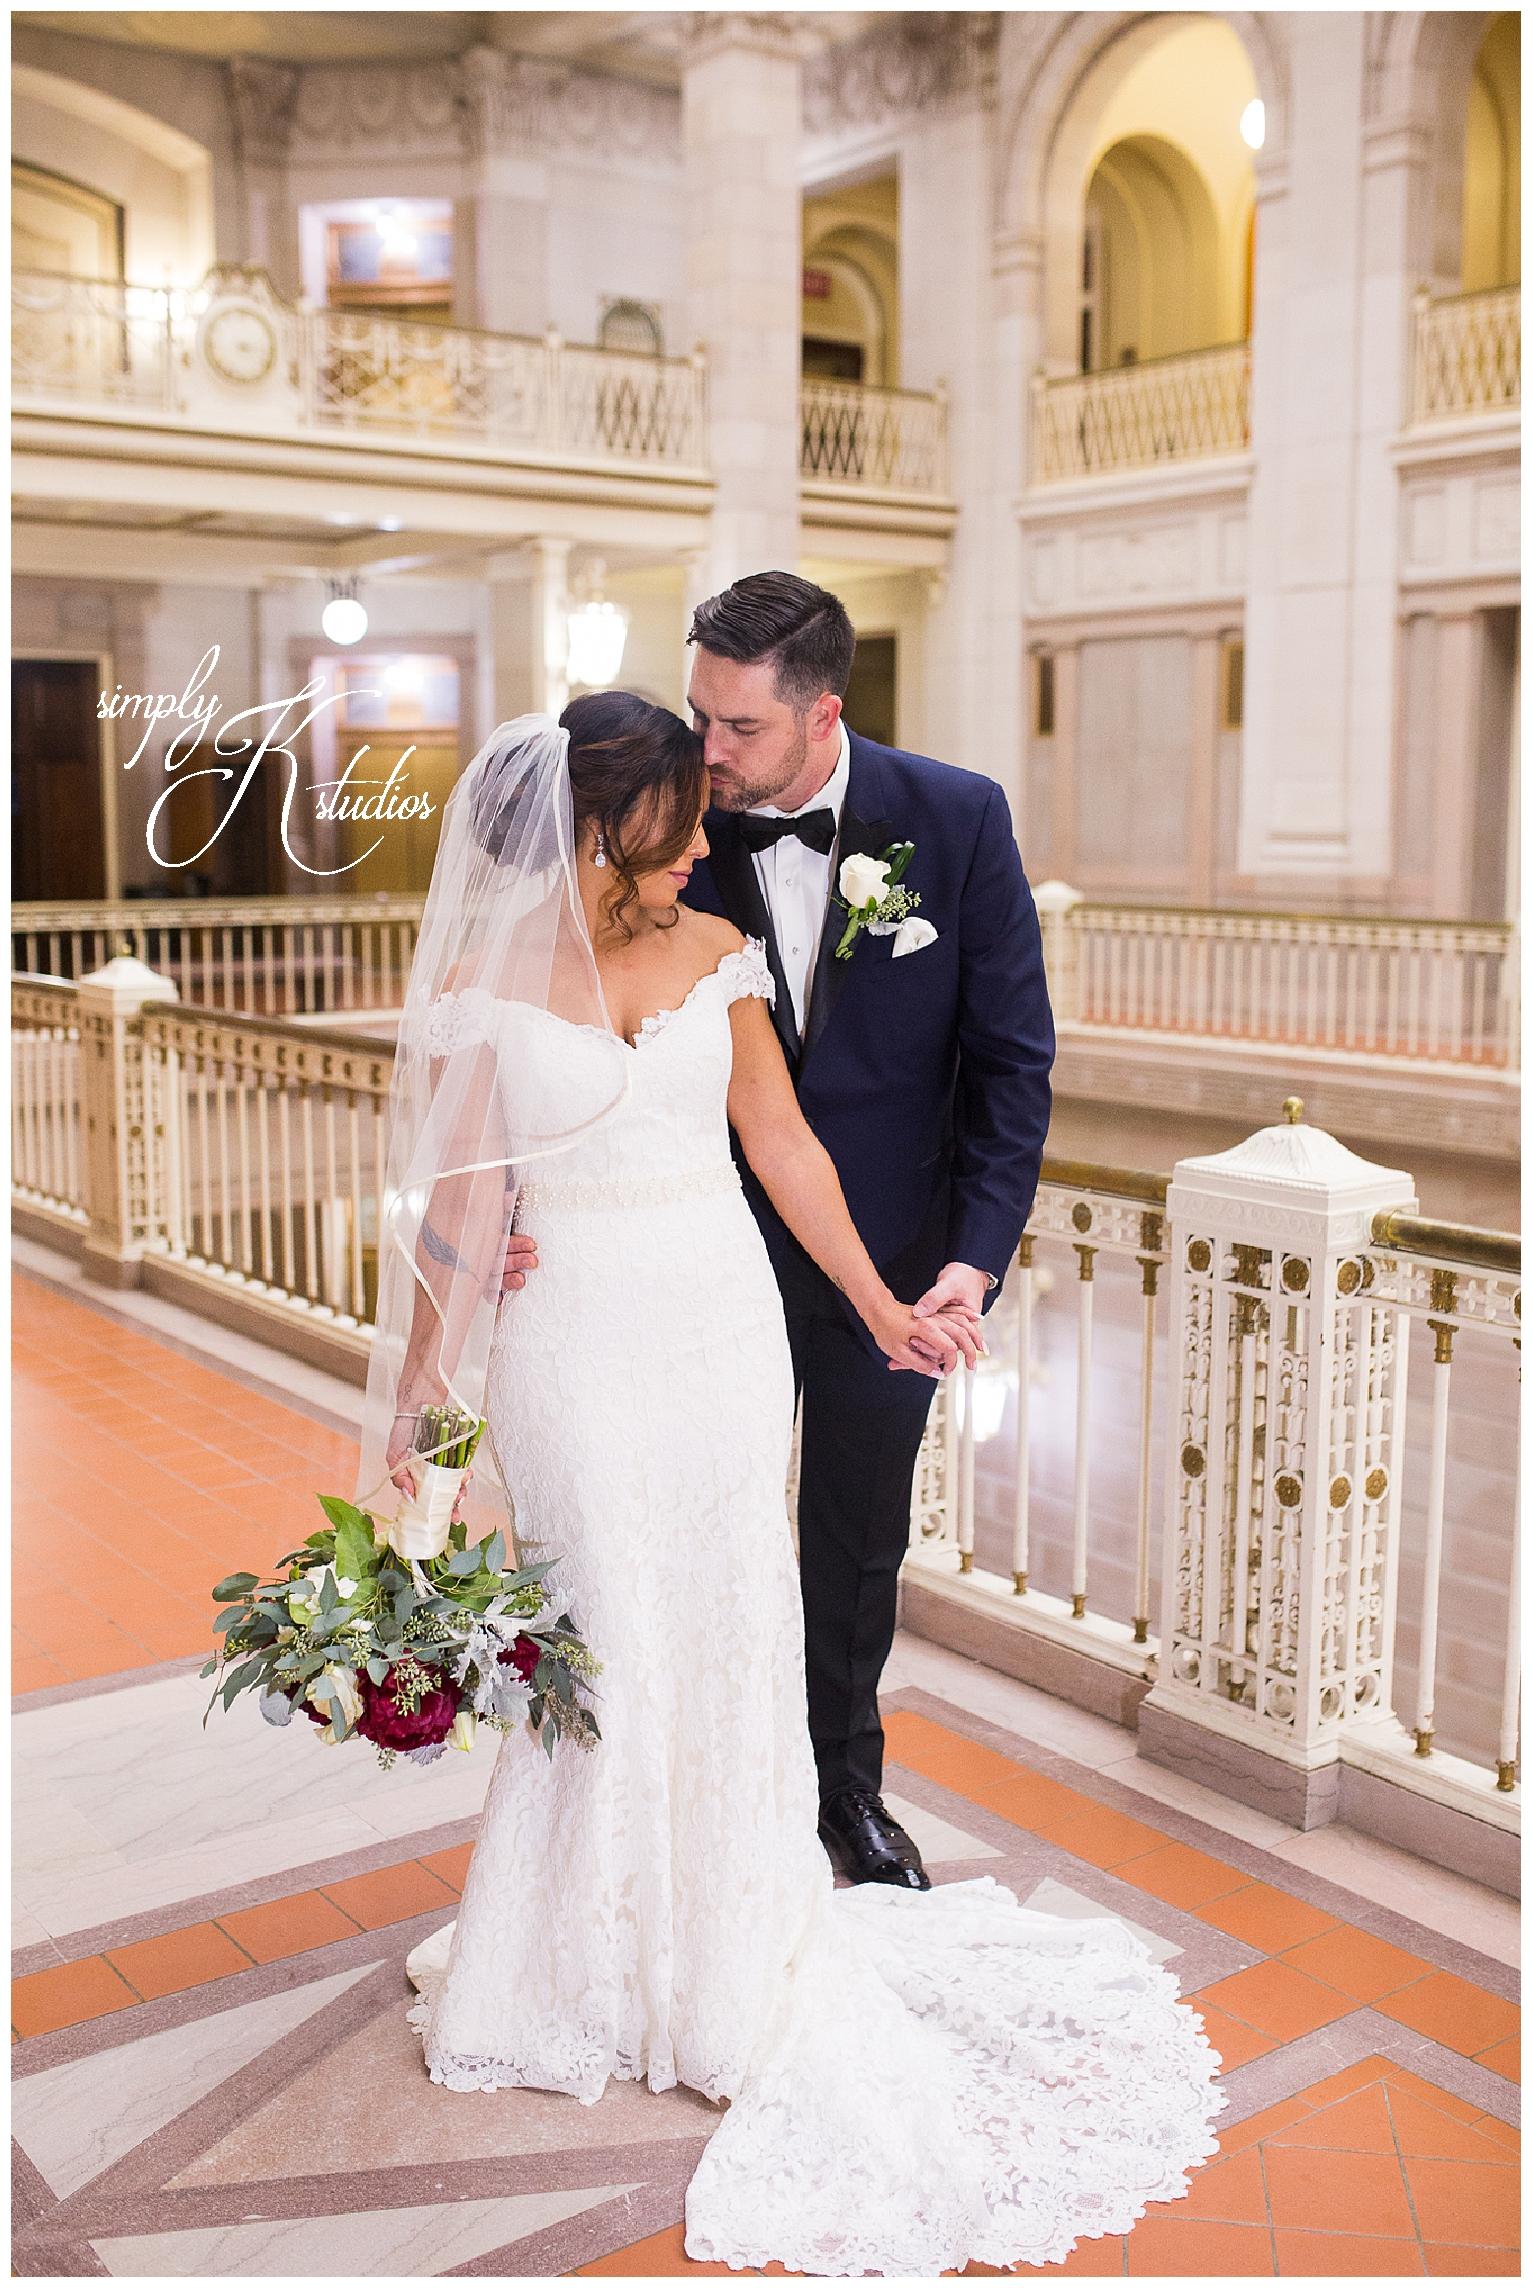 52 Simply K Studios Wedding Photography.jpg